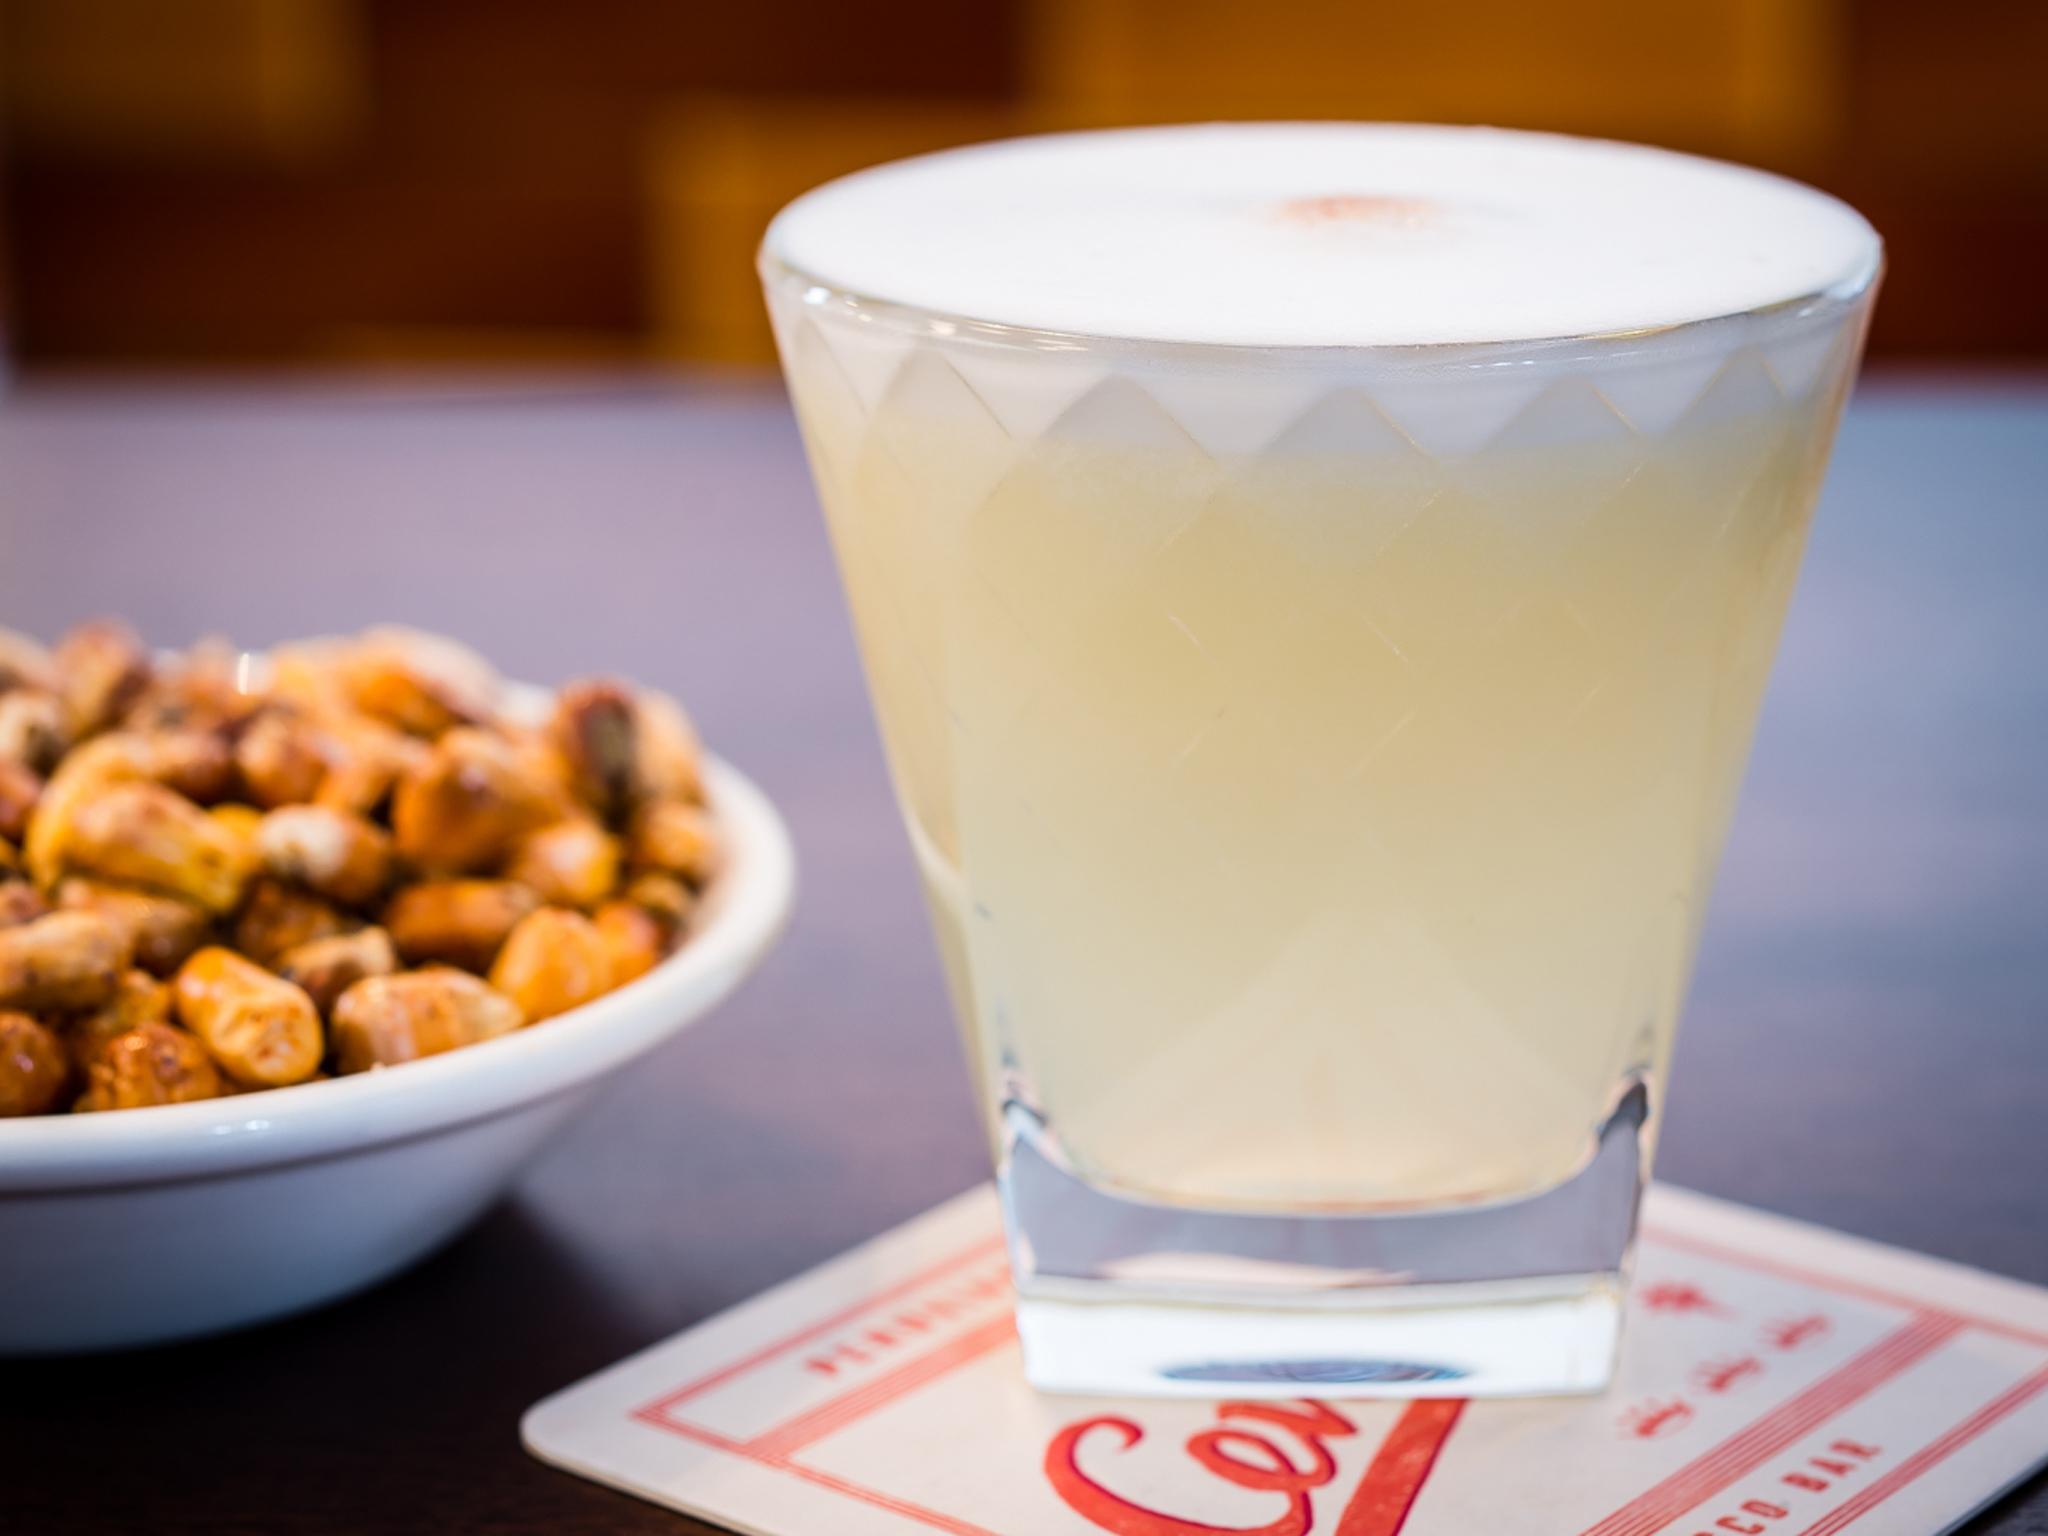 London's best pisco sours, ceviche old st